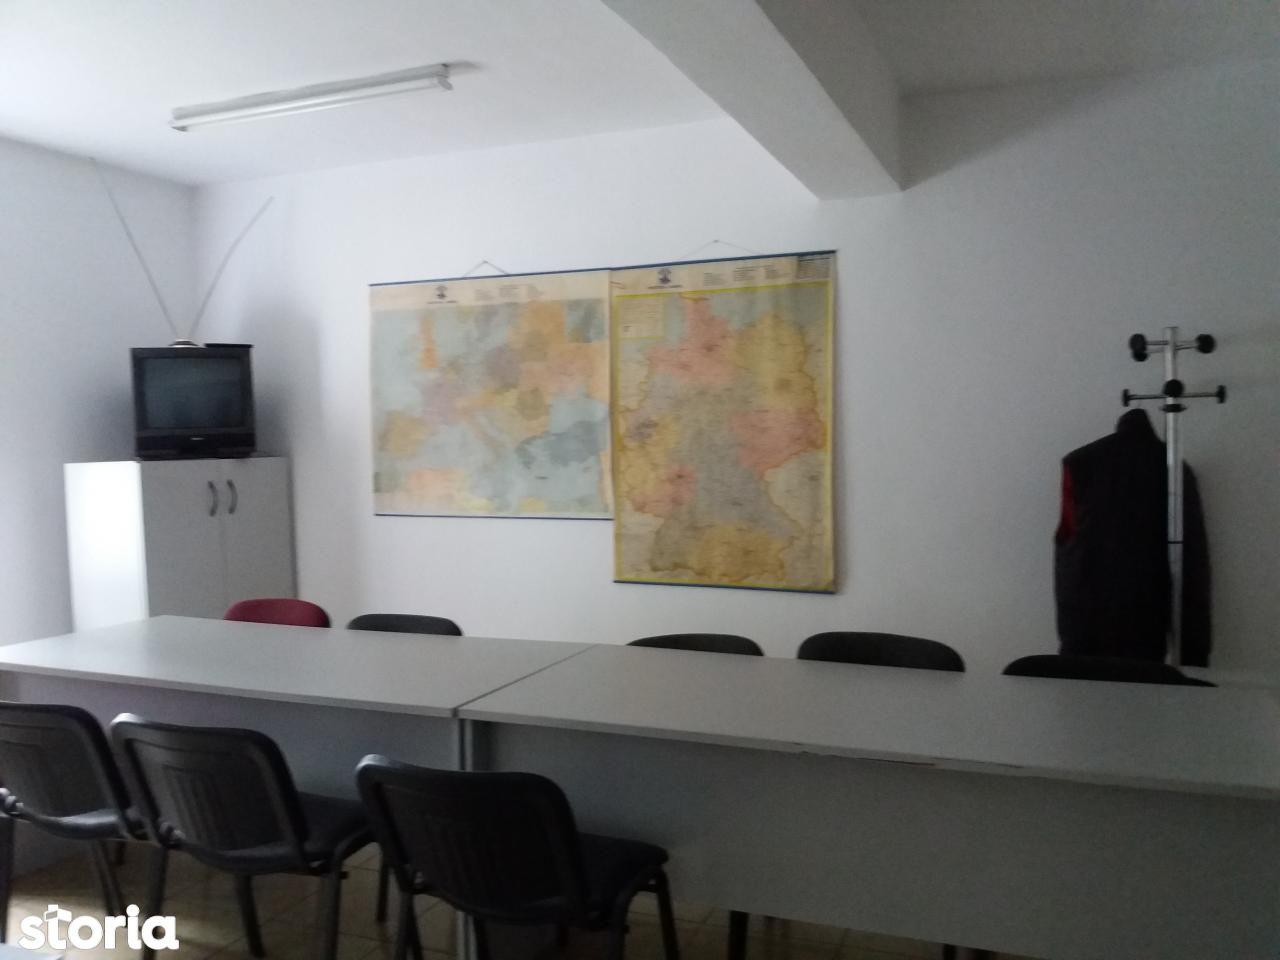 Spatiu Comercial de inchiriat, Brașov (judet), Braşov - Foto 2